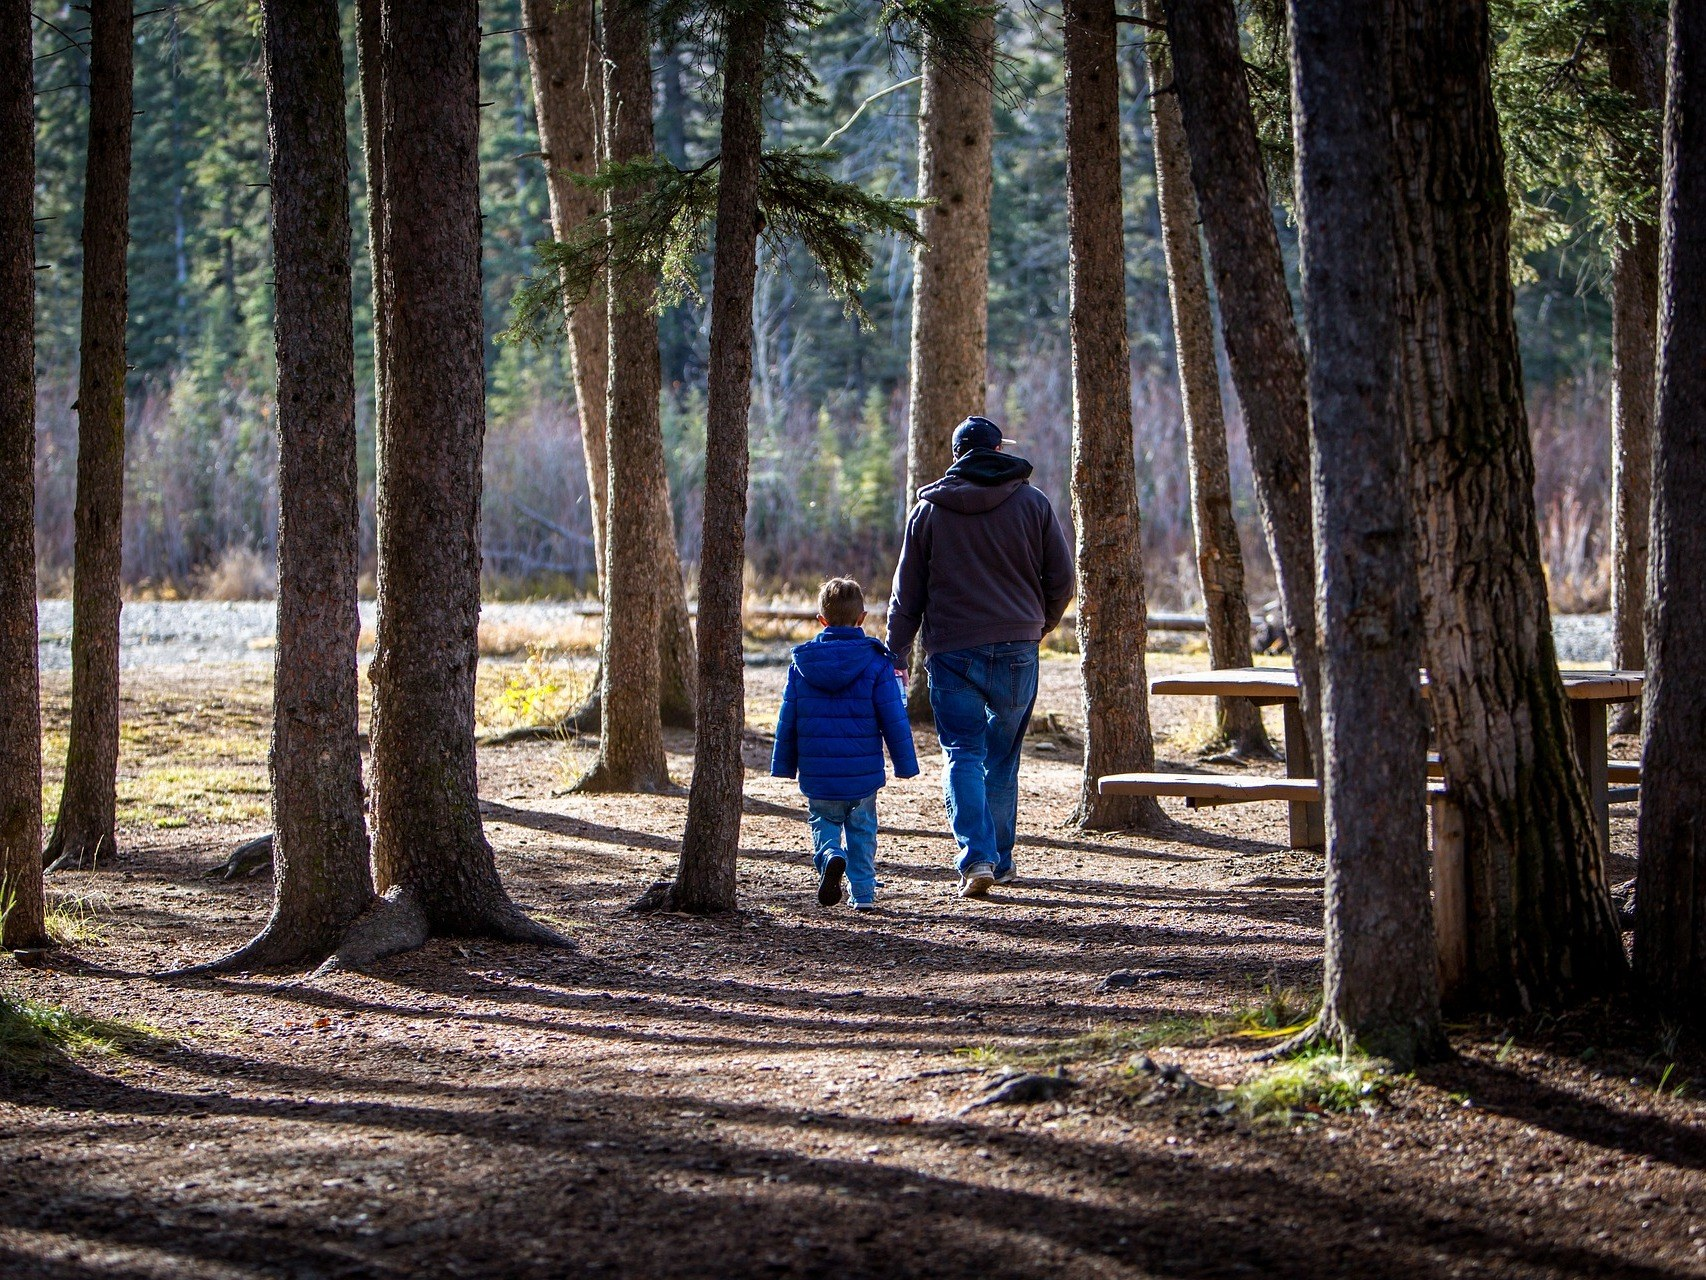 gite-hautvillers-pere-fils-enfant-arbre-nature